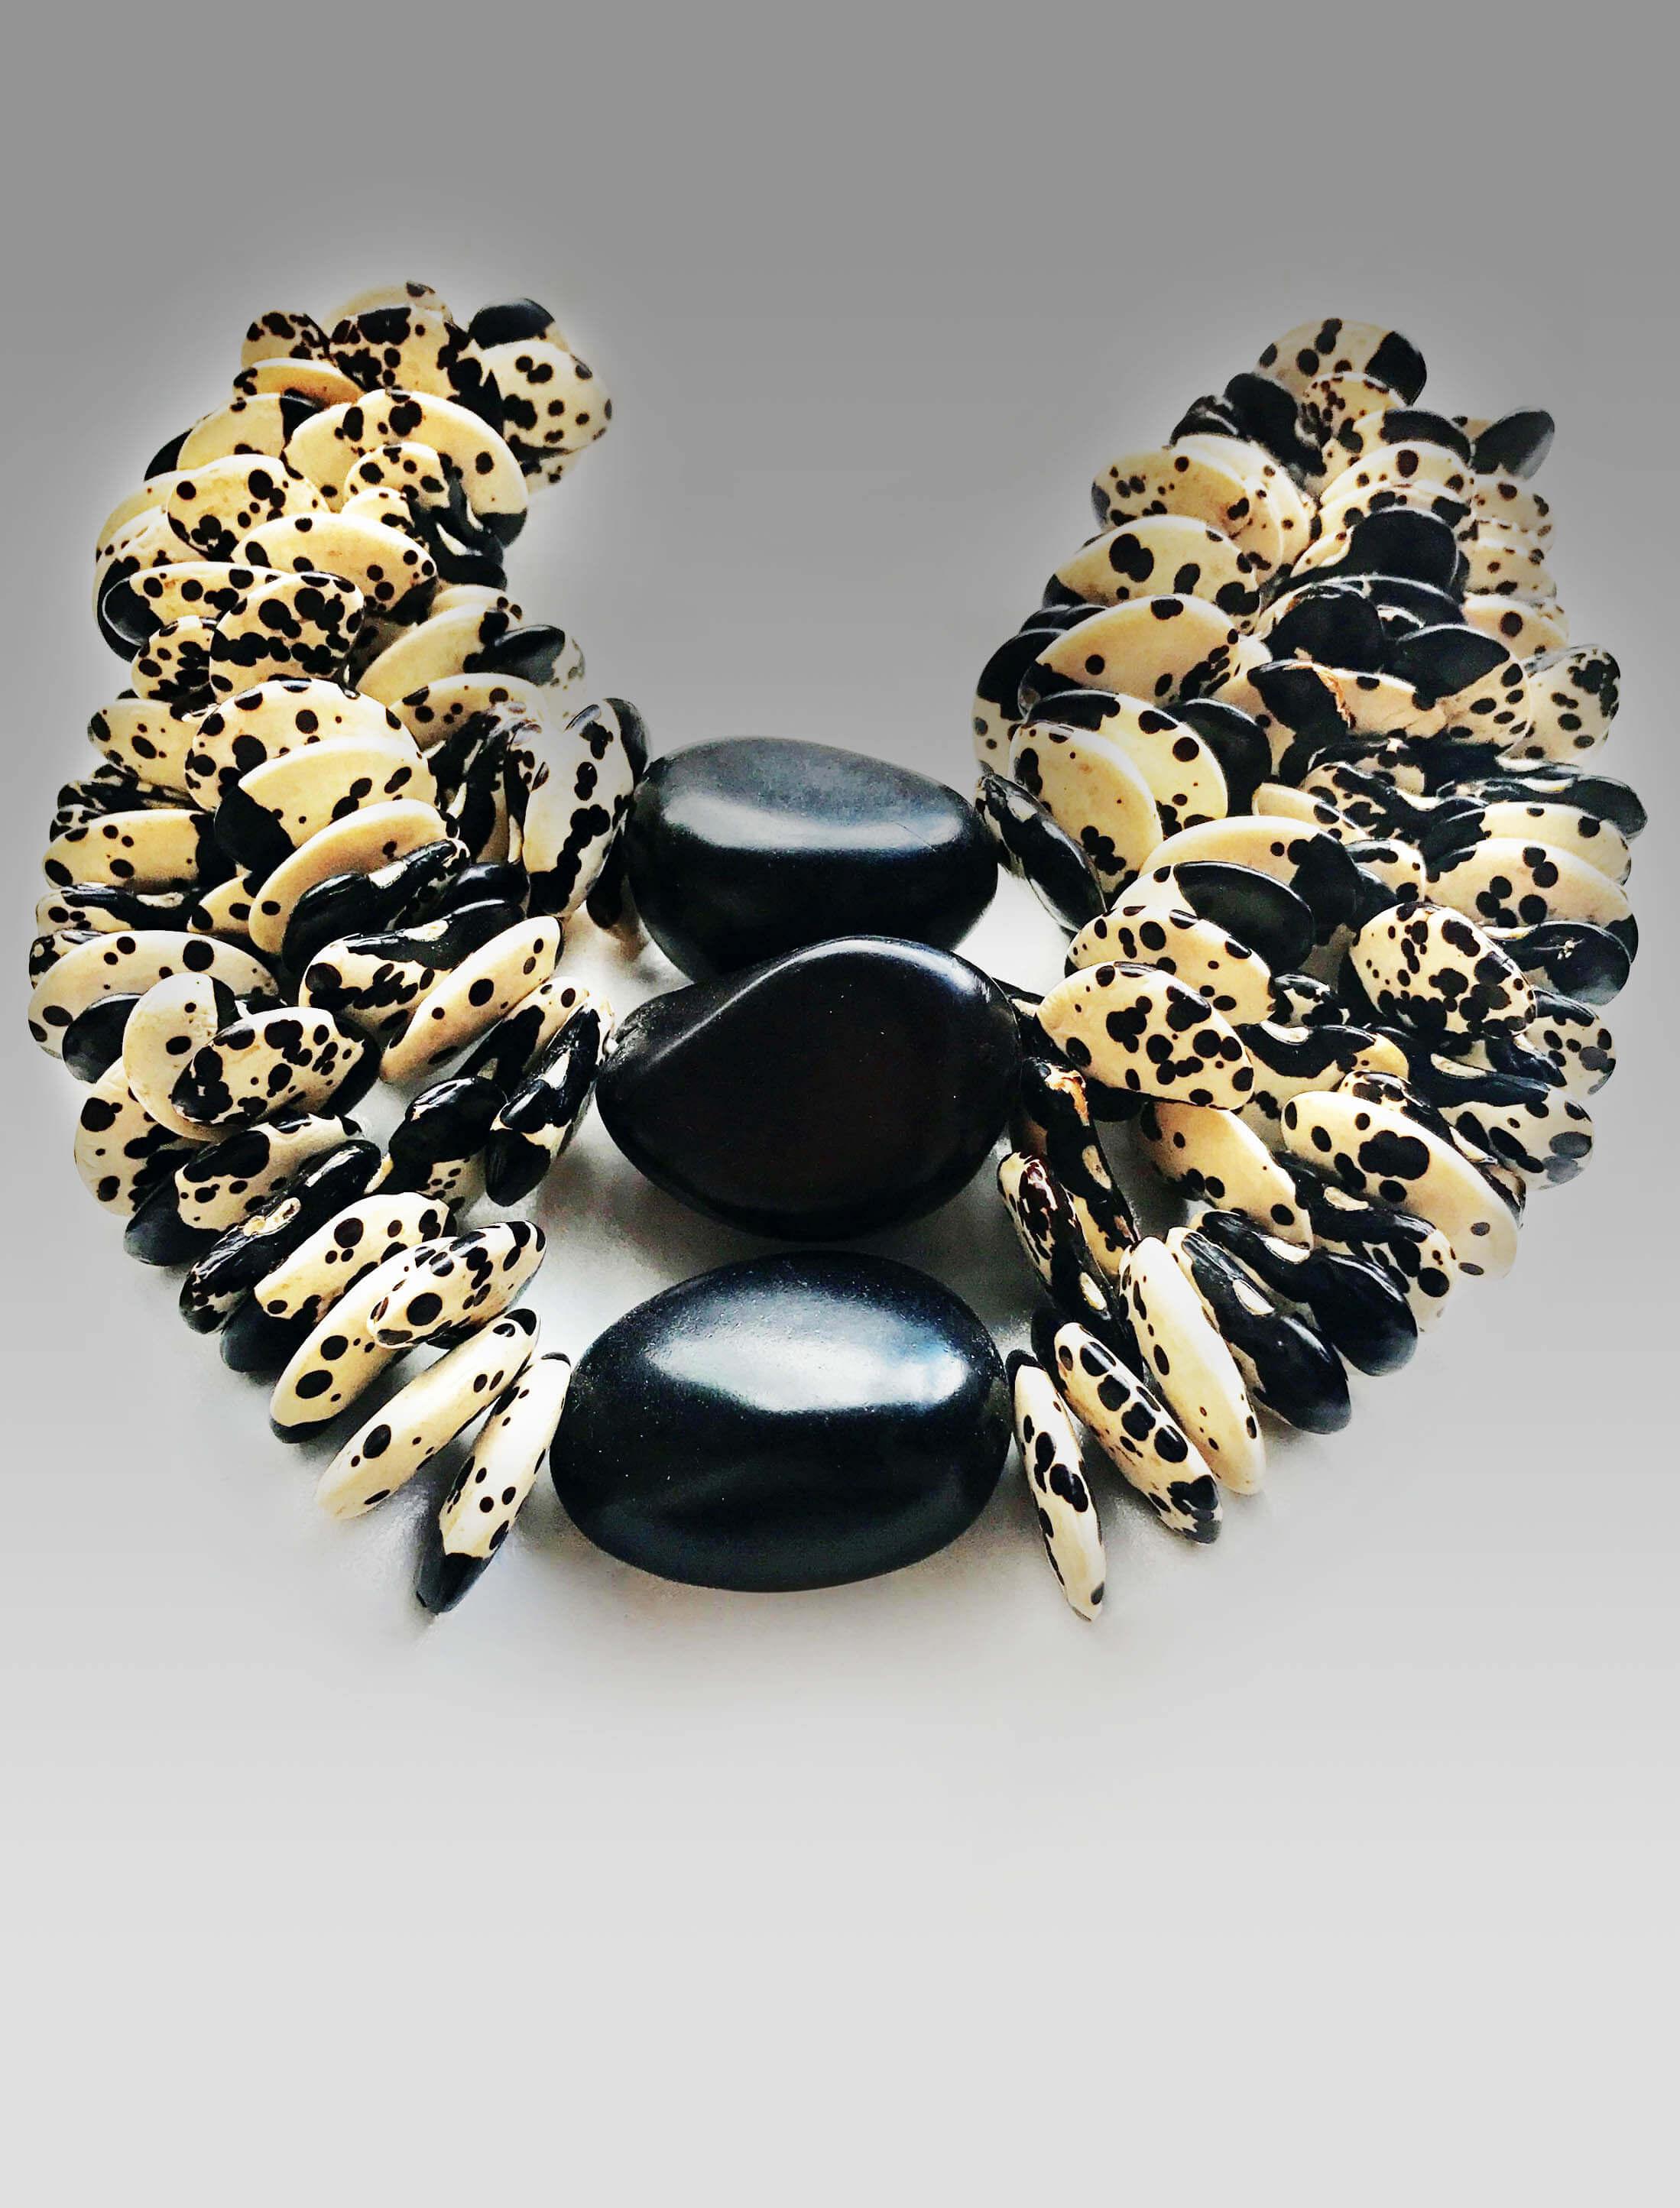 Natural Sur, Liliana Castillo, Handmade Jewelry, Woodstock-New Paltz Art & Crafts Fair